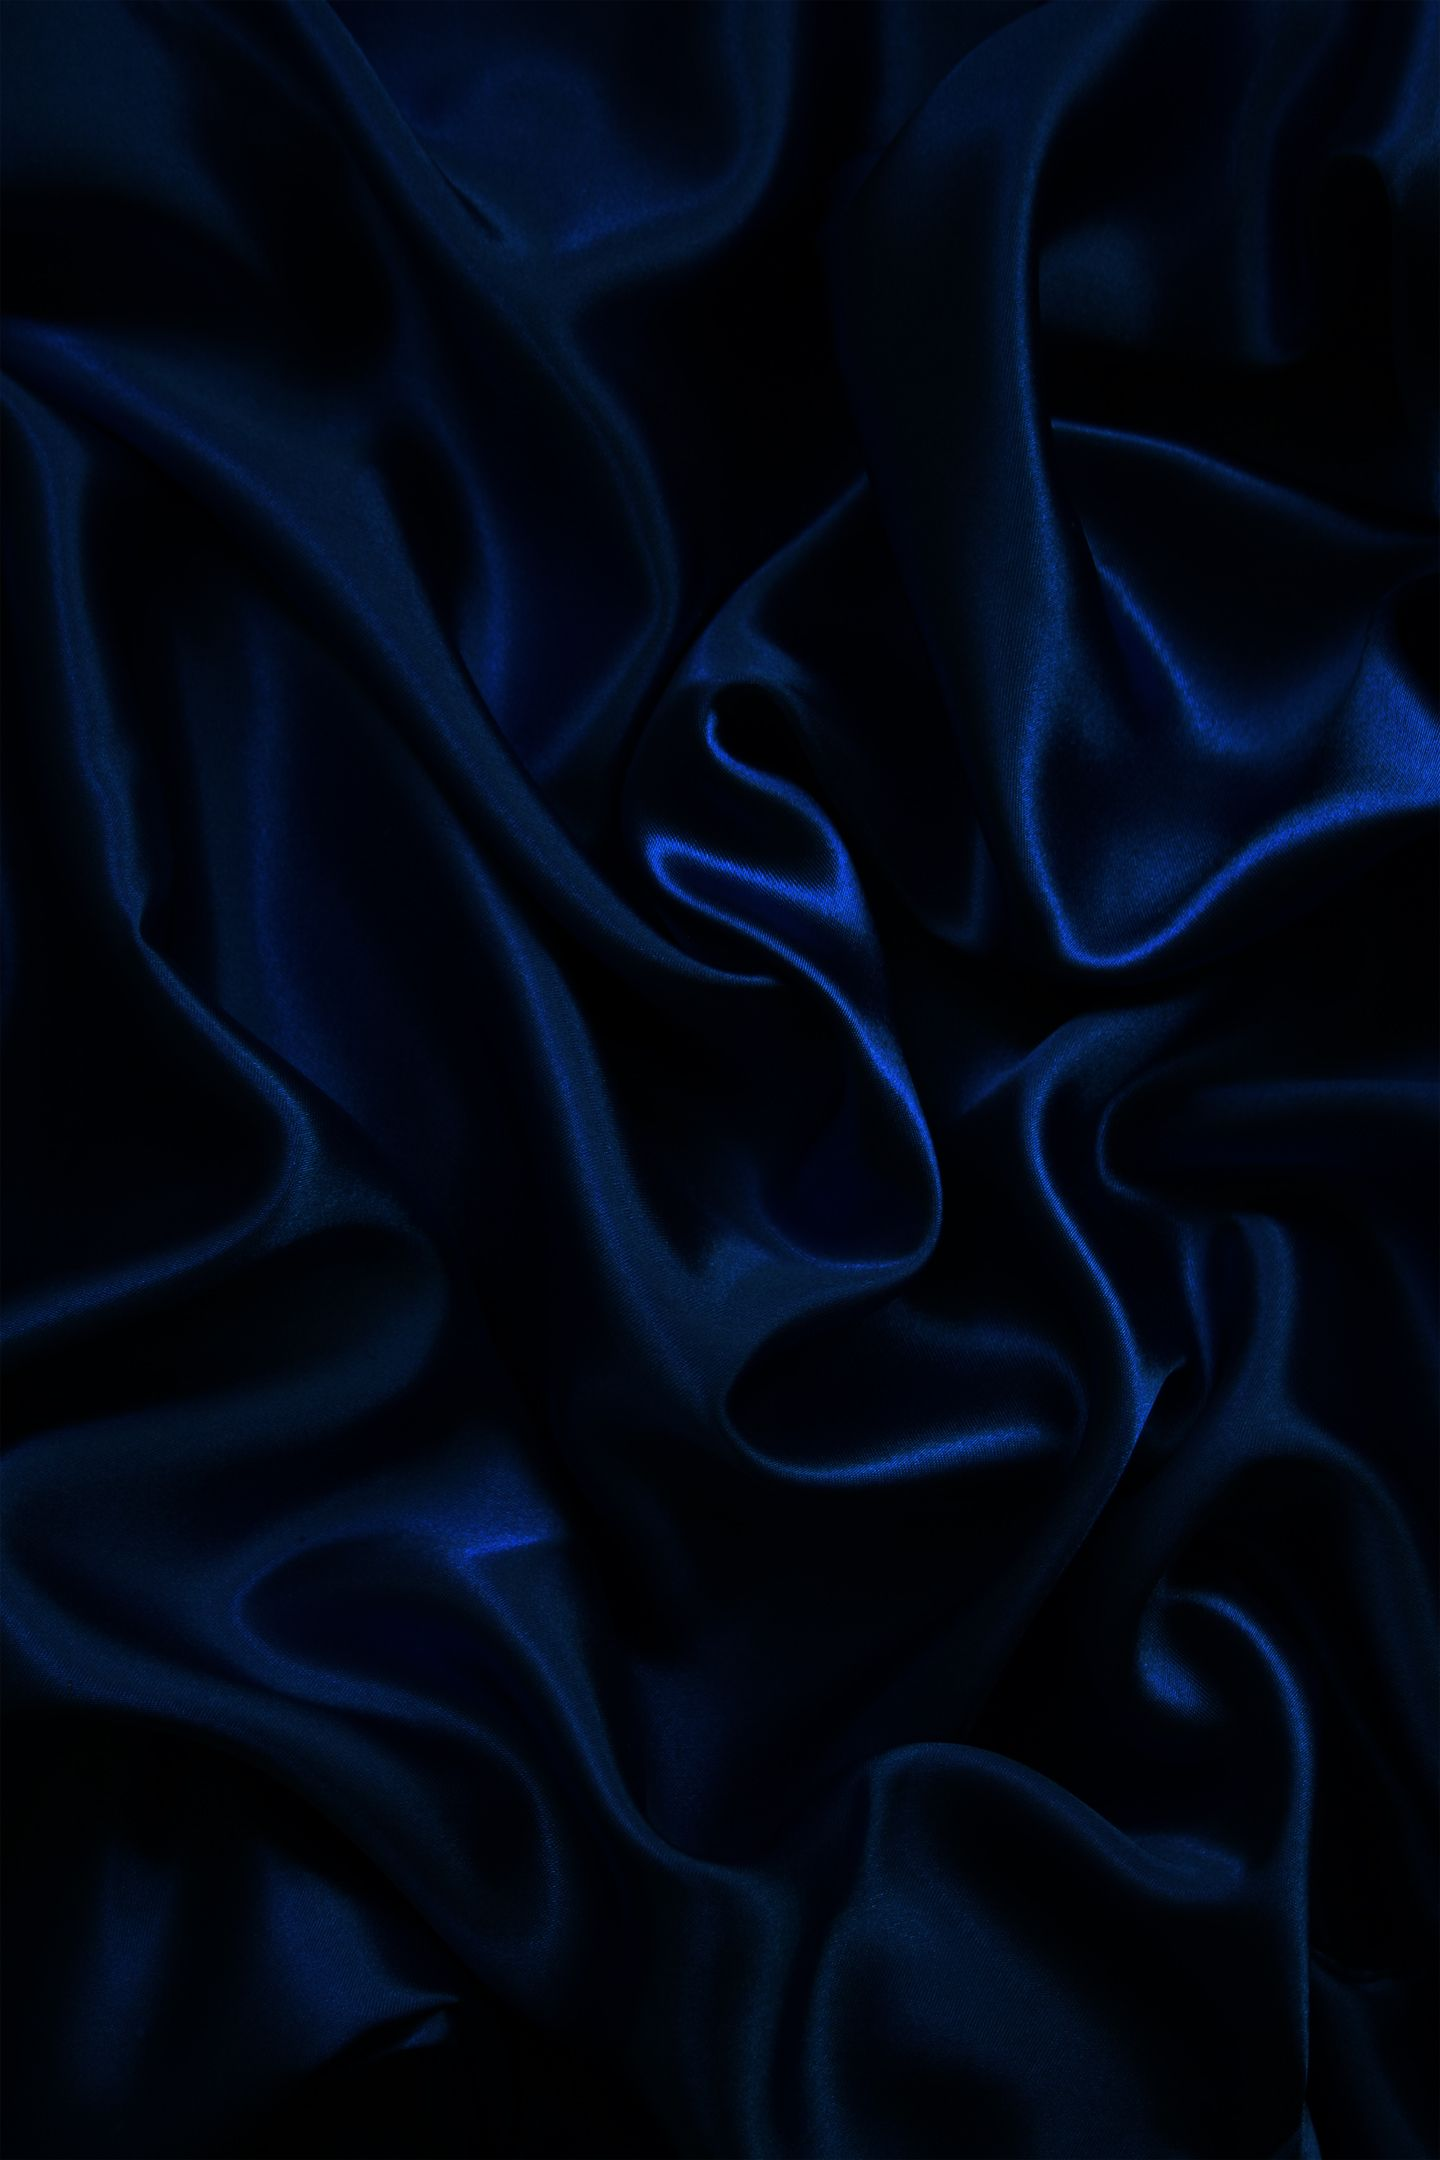 Free photo: Blue Velvet Background - Blue, Cloth, Elegant ...